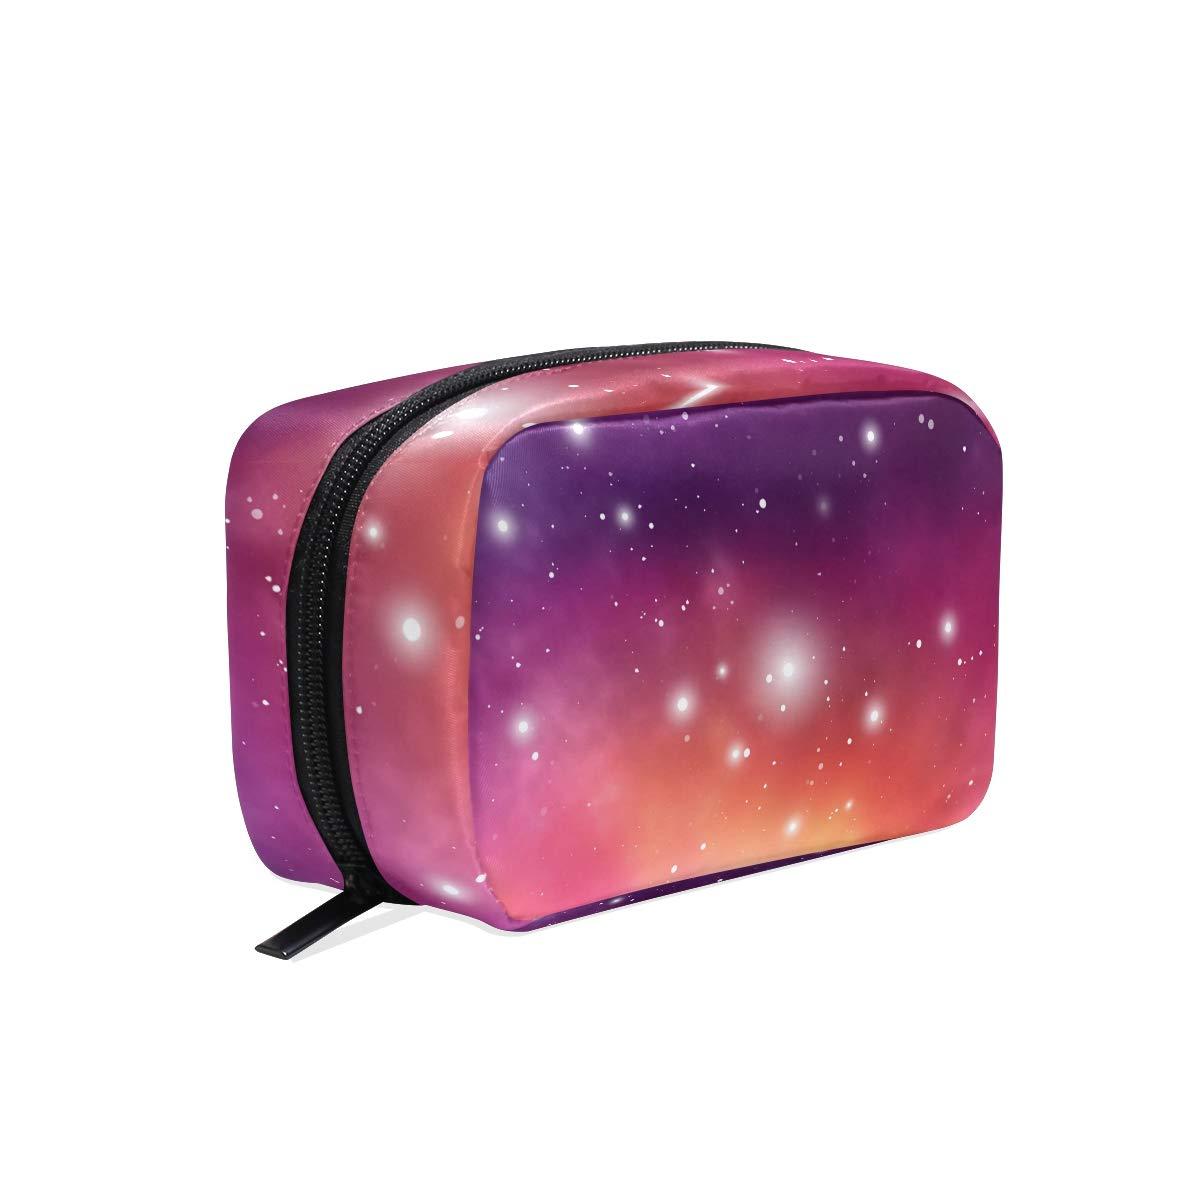 Makeup Bag Portable Travel Cosmetic Bags Purple Starlight Storage Bag for Women Skincare Makeup Train Case